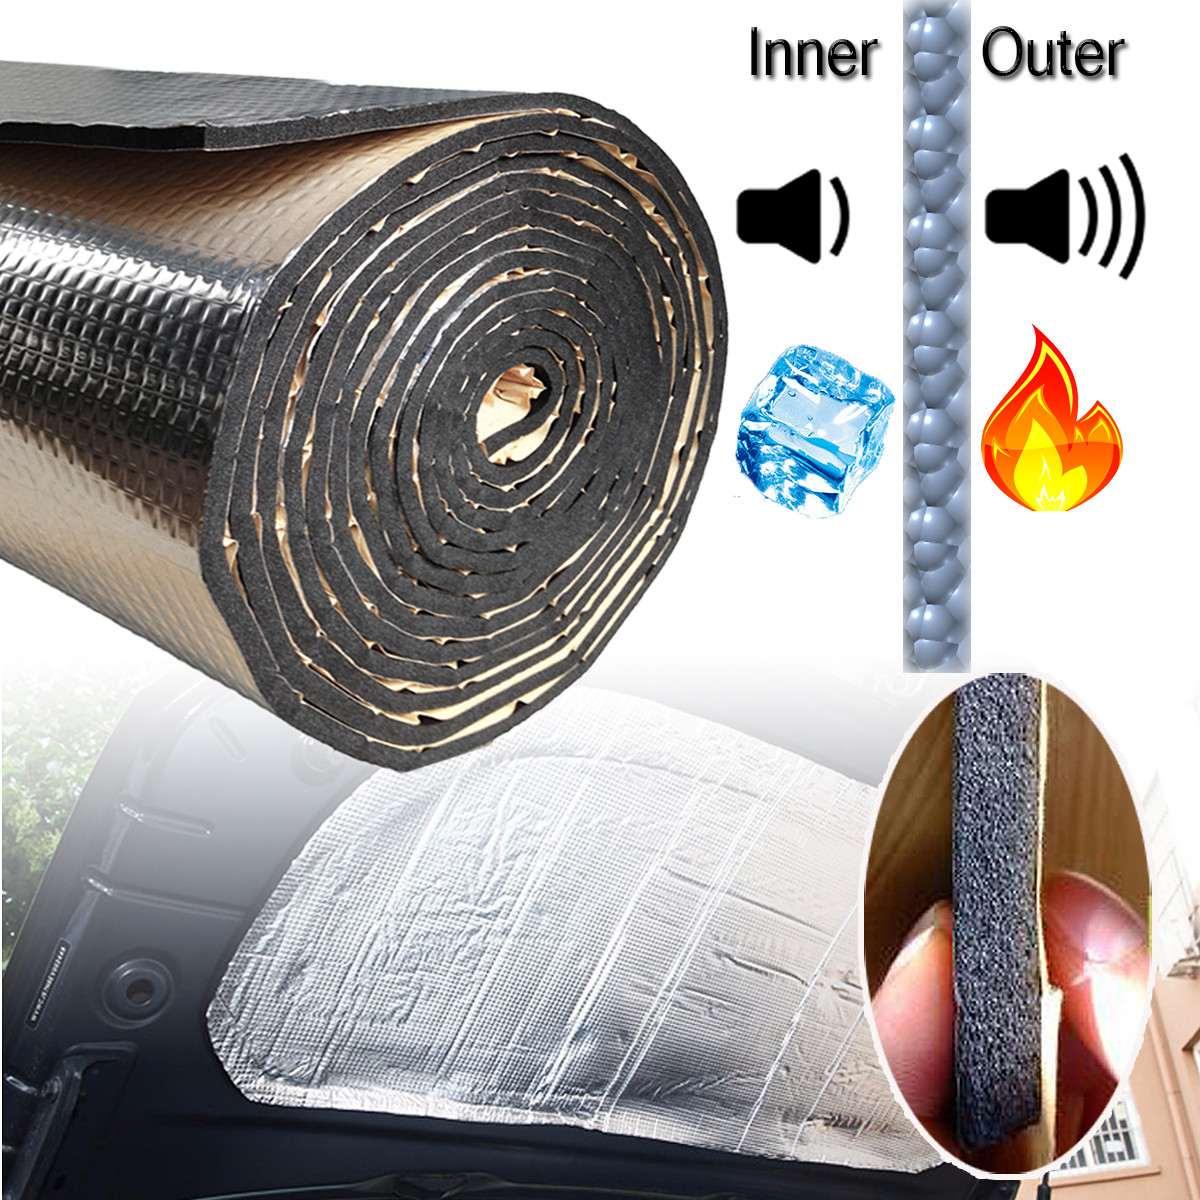 140 cm x 100 cm Auto Haube Motor Firewall Wärme Matte Deadener Sound motorhaube Isolierung Trittschalldämmung Material Aluminium Folie Aufkleber